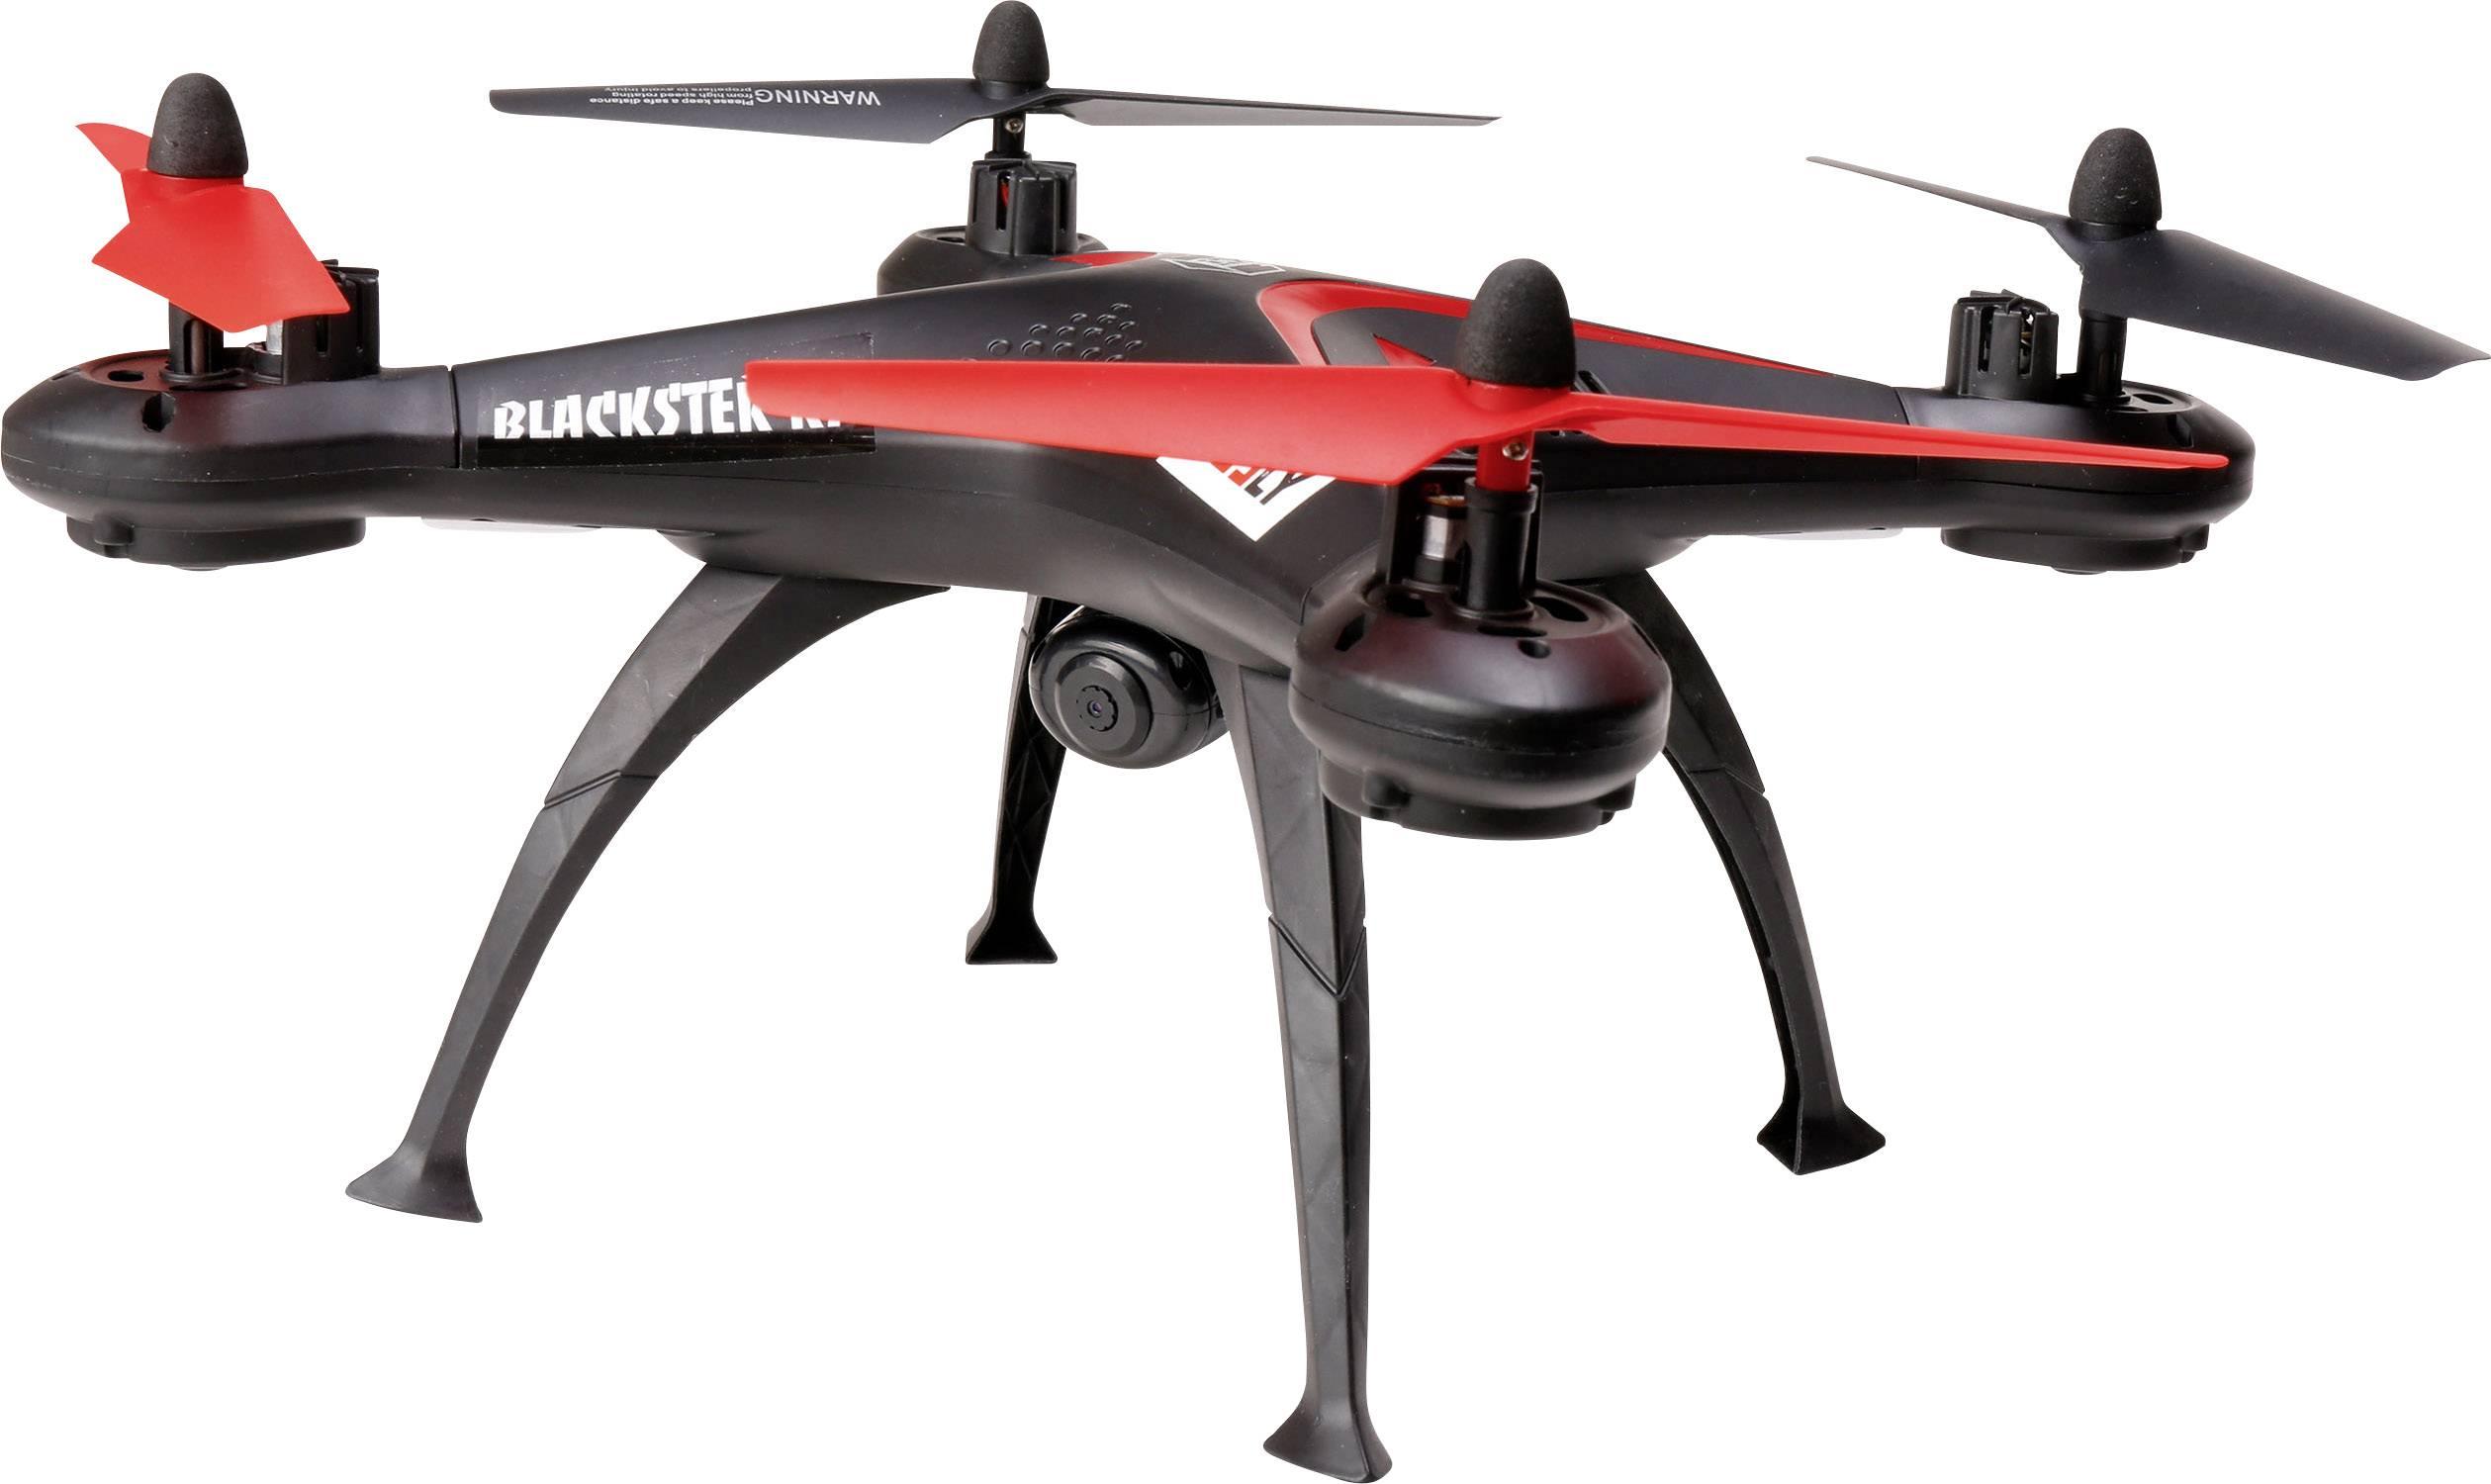 Dron Reely Blackster R7 2.0 FPV WiFi, RtF, s kamerou